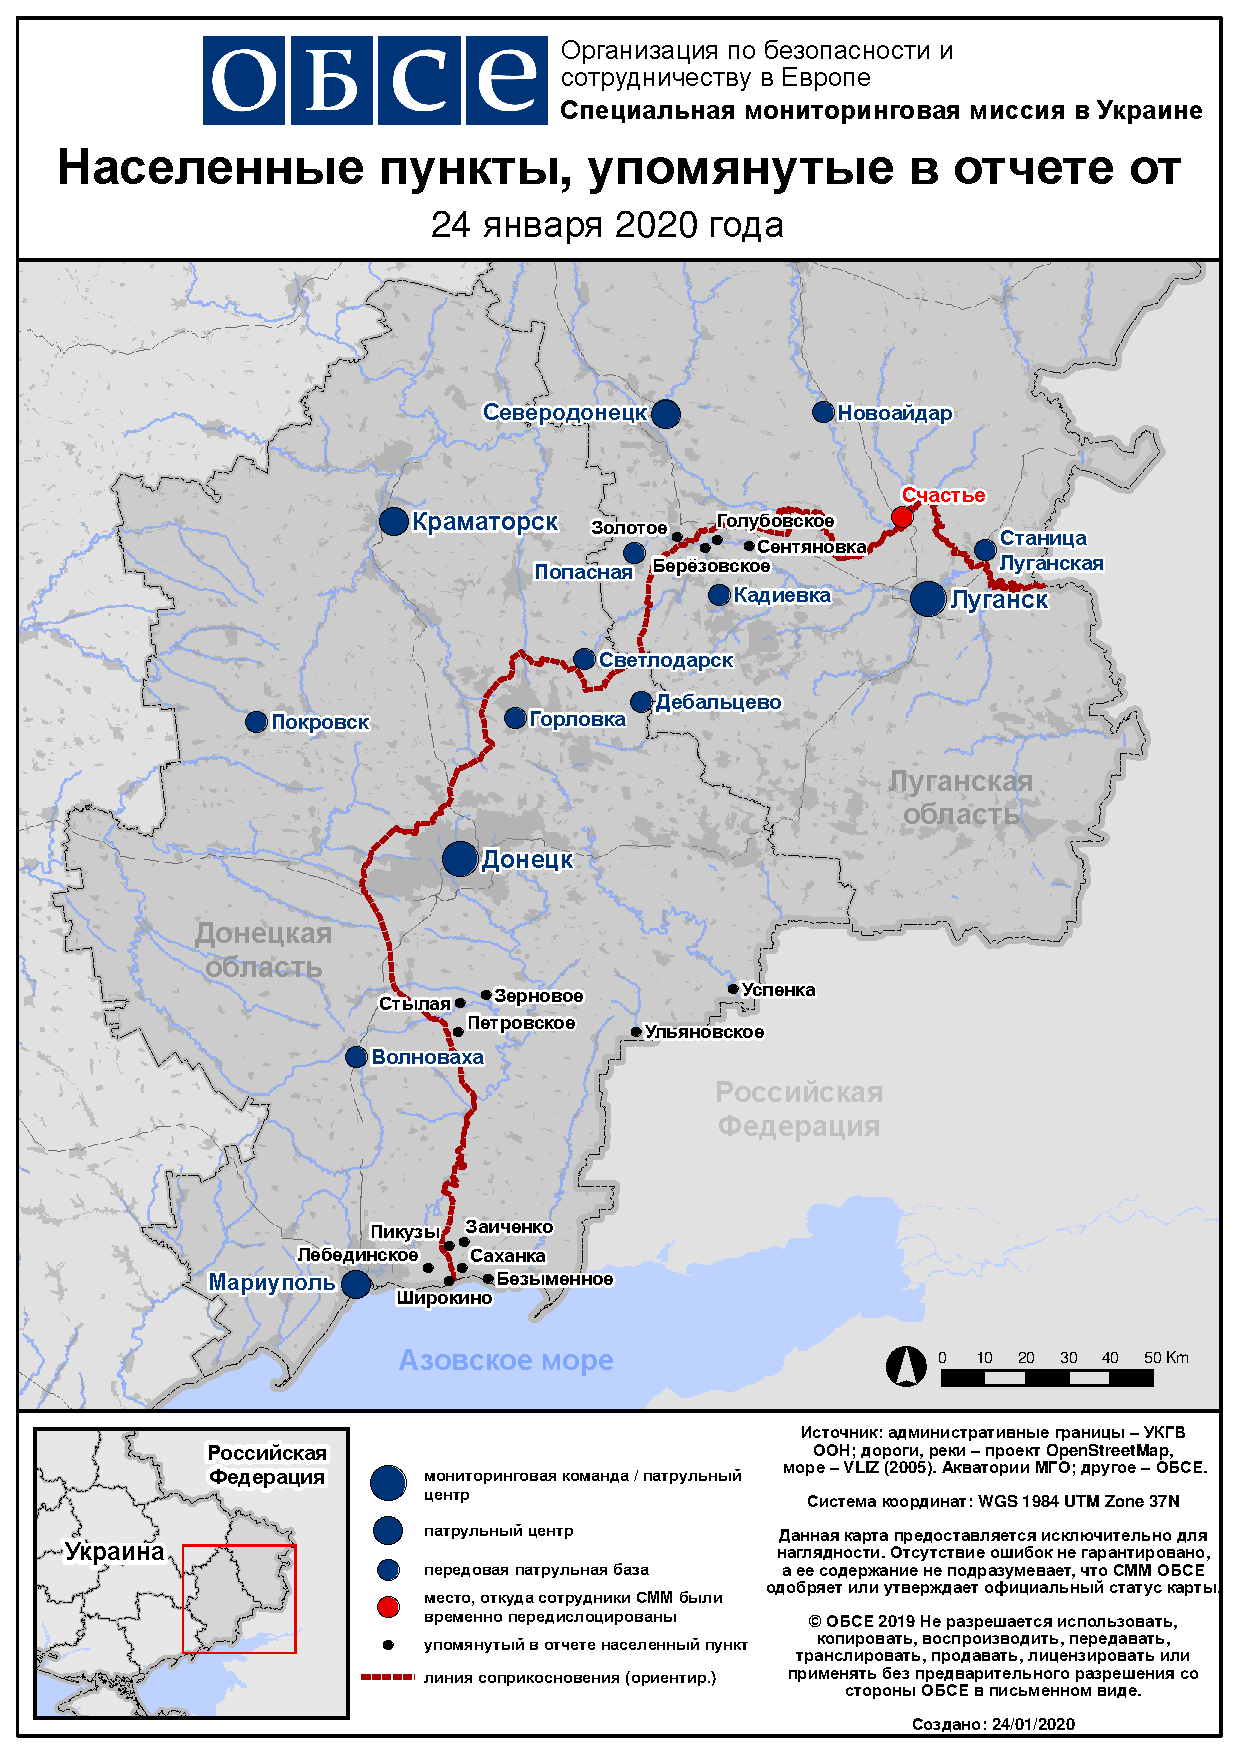 map_settlements--2020-01-23